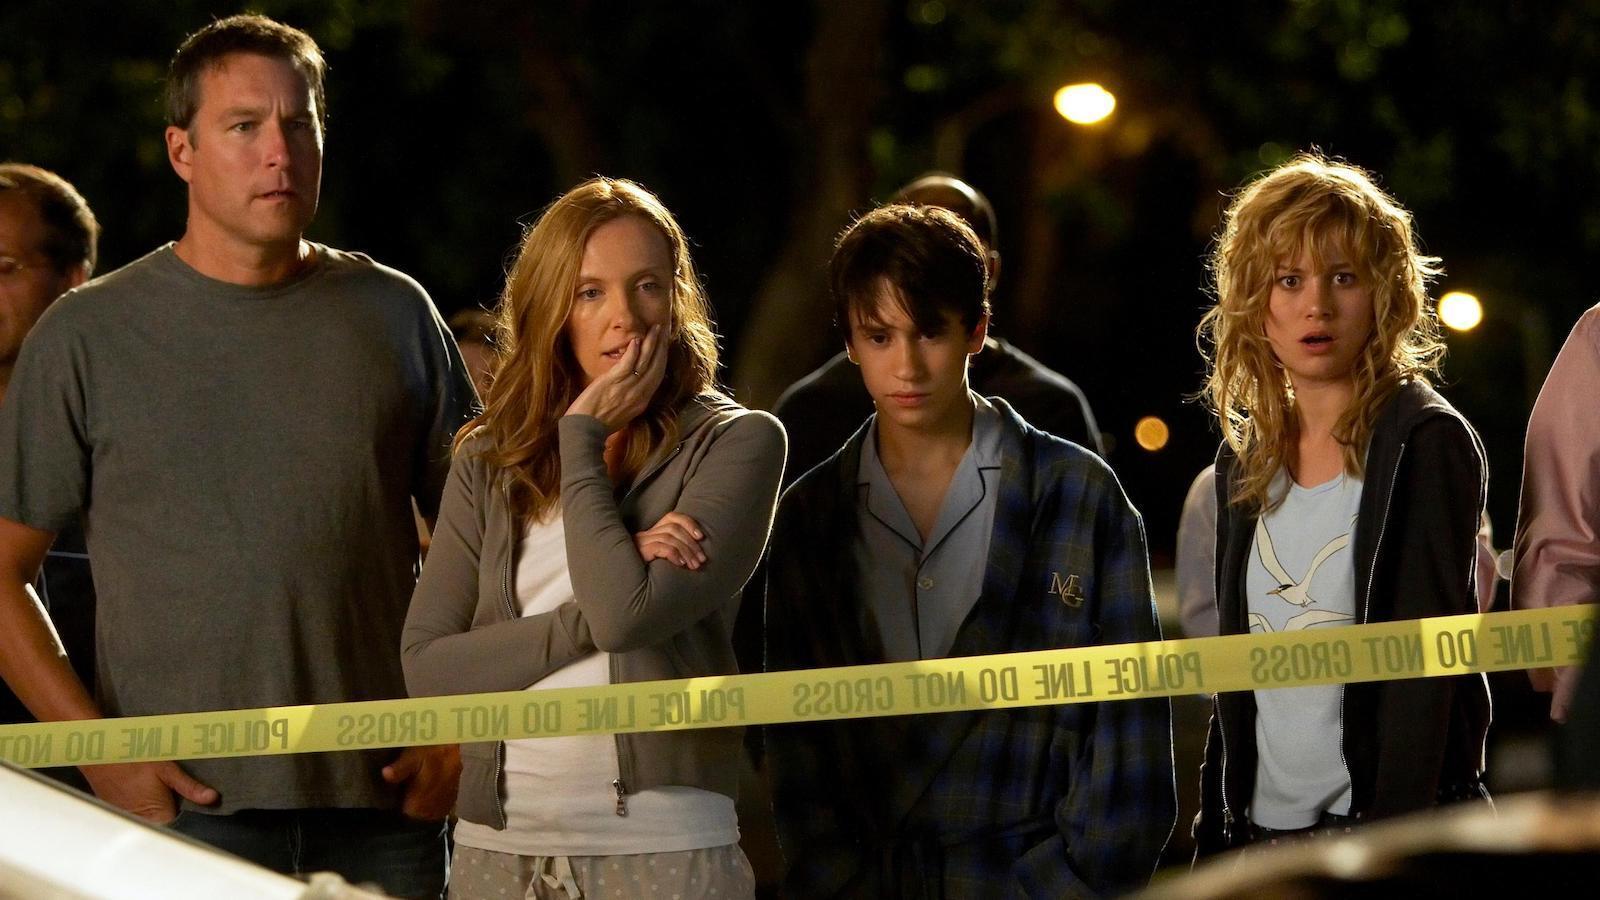 John Corbett, Toni Collette, Keir Gilchrist, and Brie Larson, United States of Tara